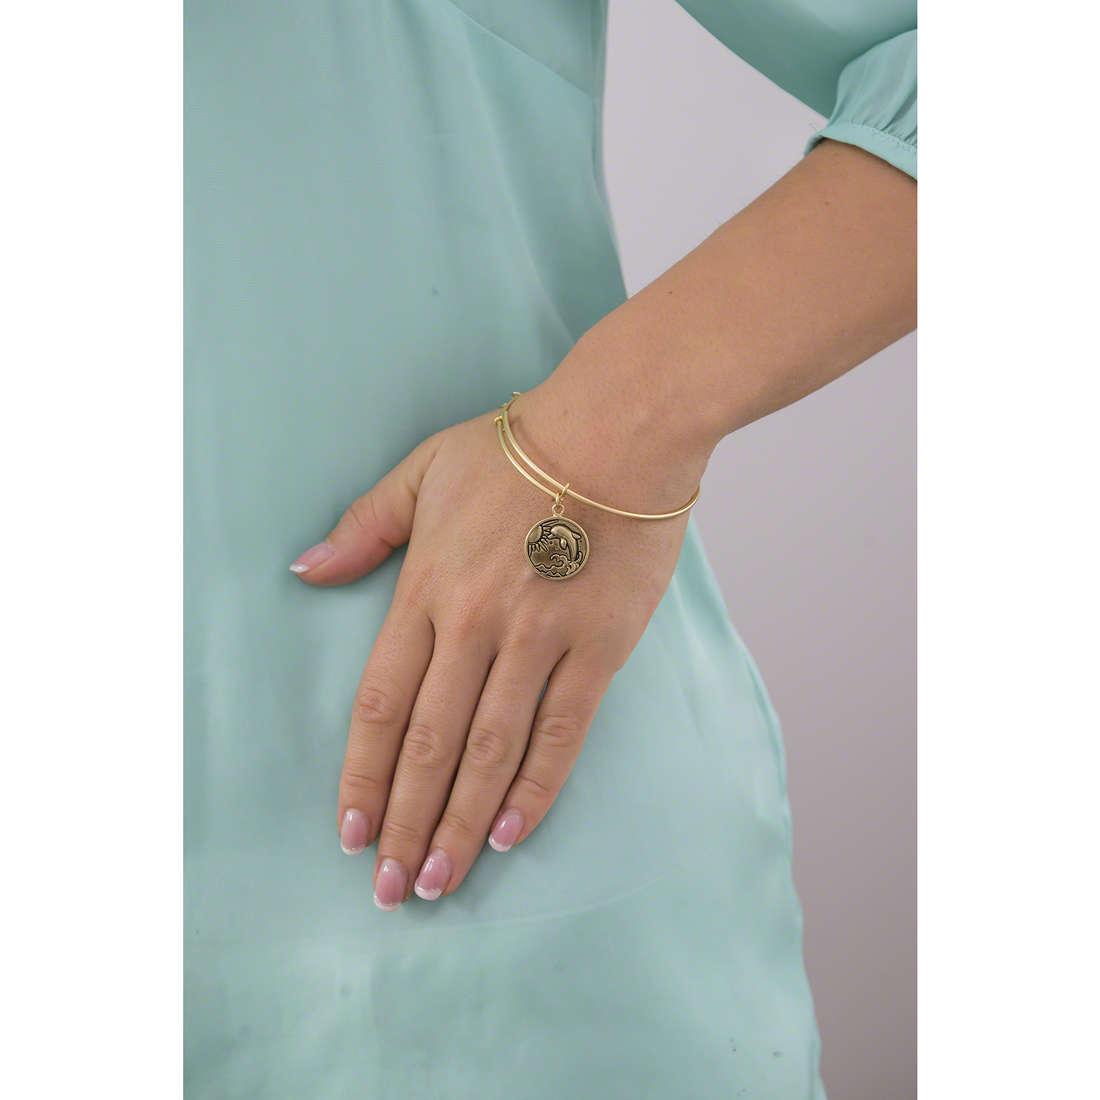 Chrysalis bracciali donna CRBT0608GP indosso